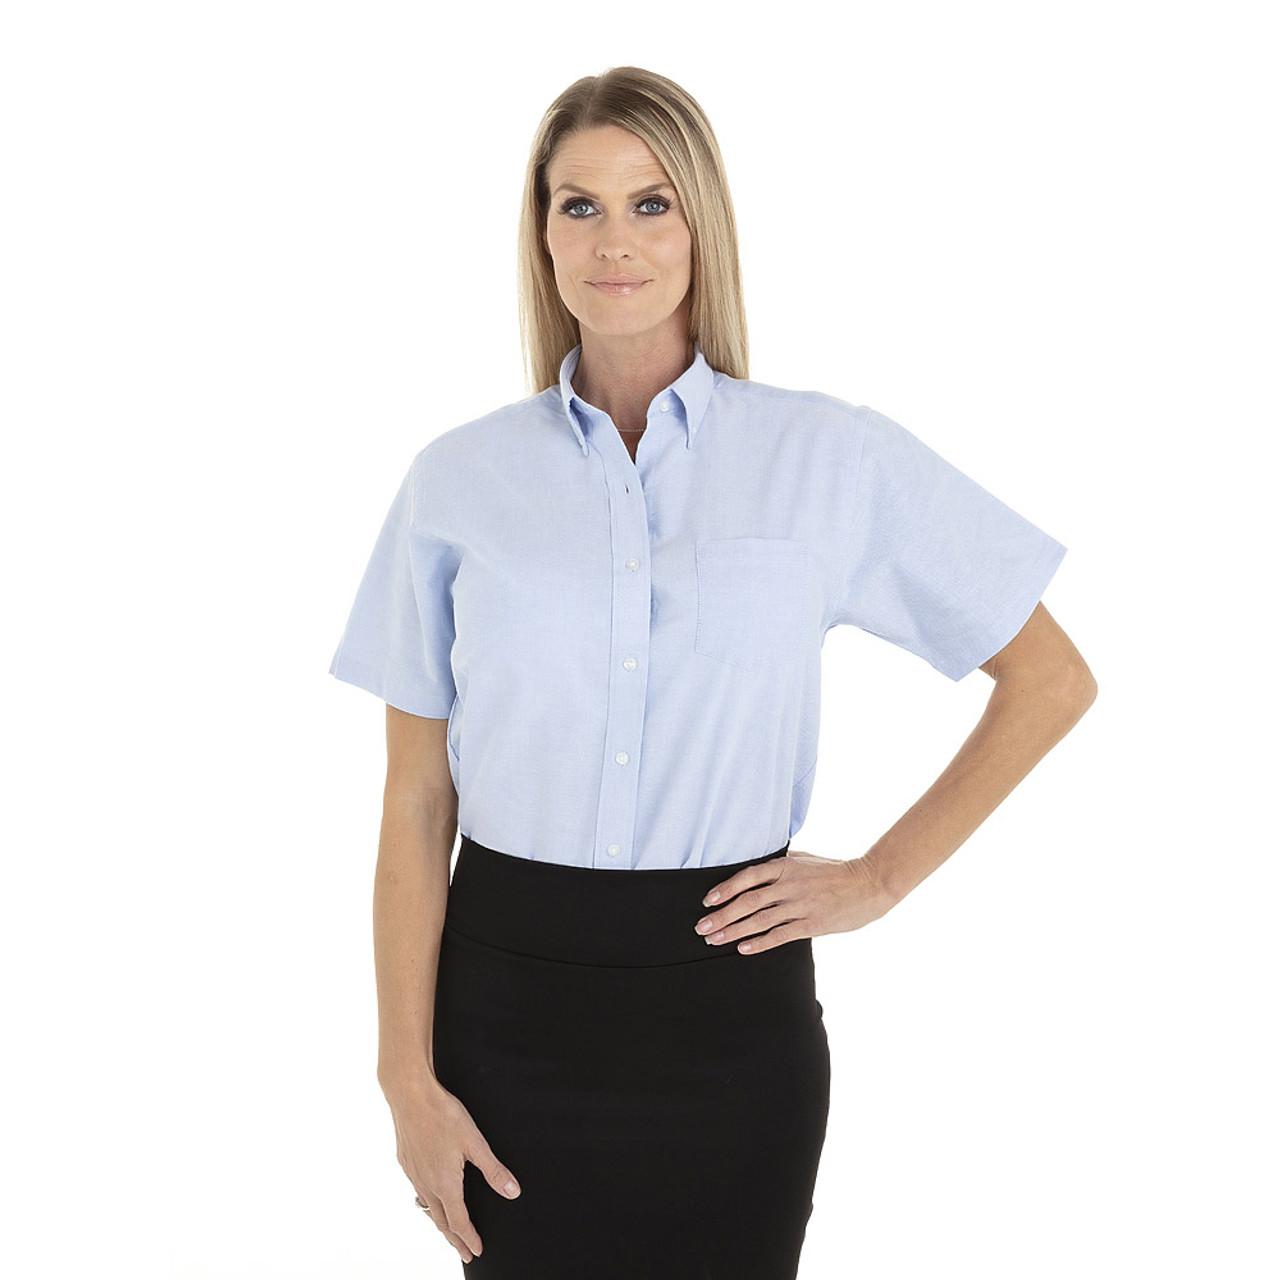 Blue - 18CV301 Van Heusen Ladies' Short Sleeve Oxford Shirt -T-shirt.ca